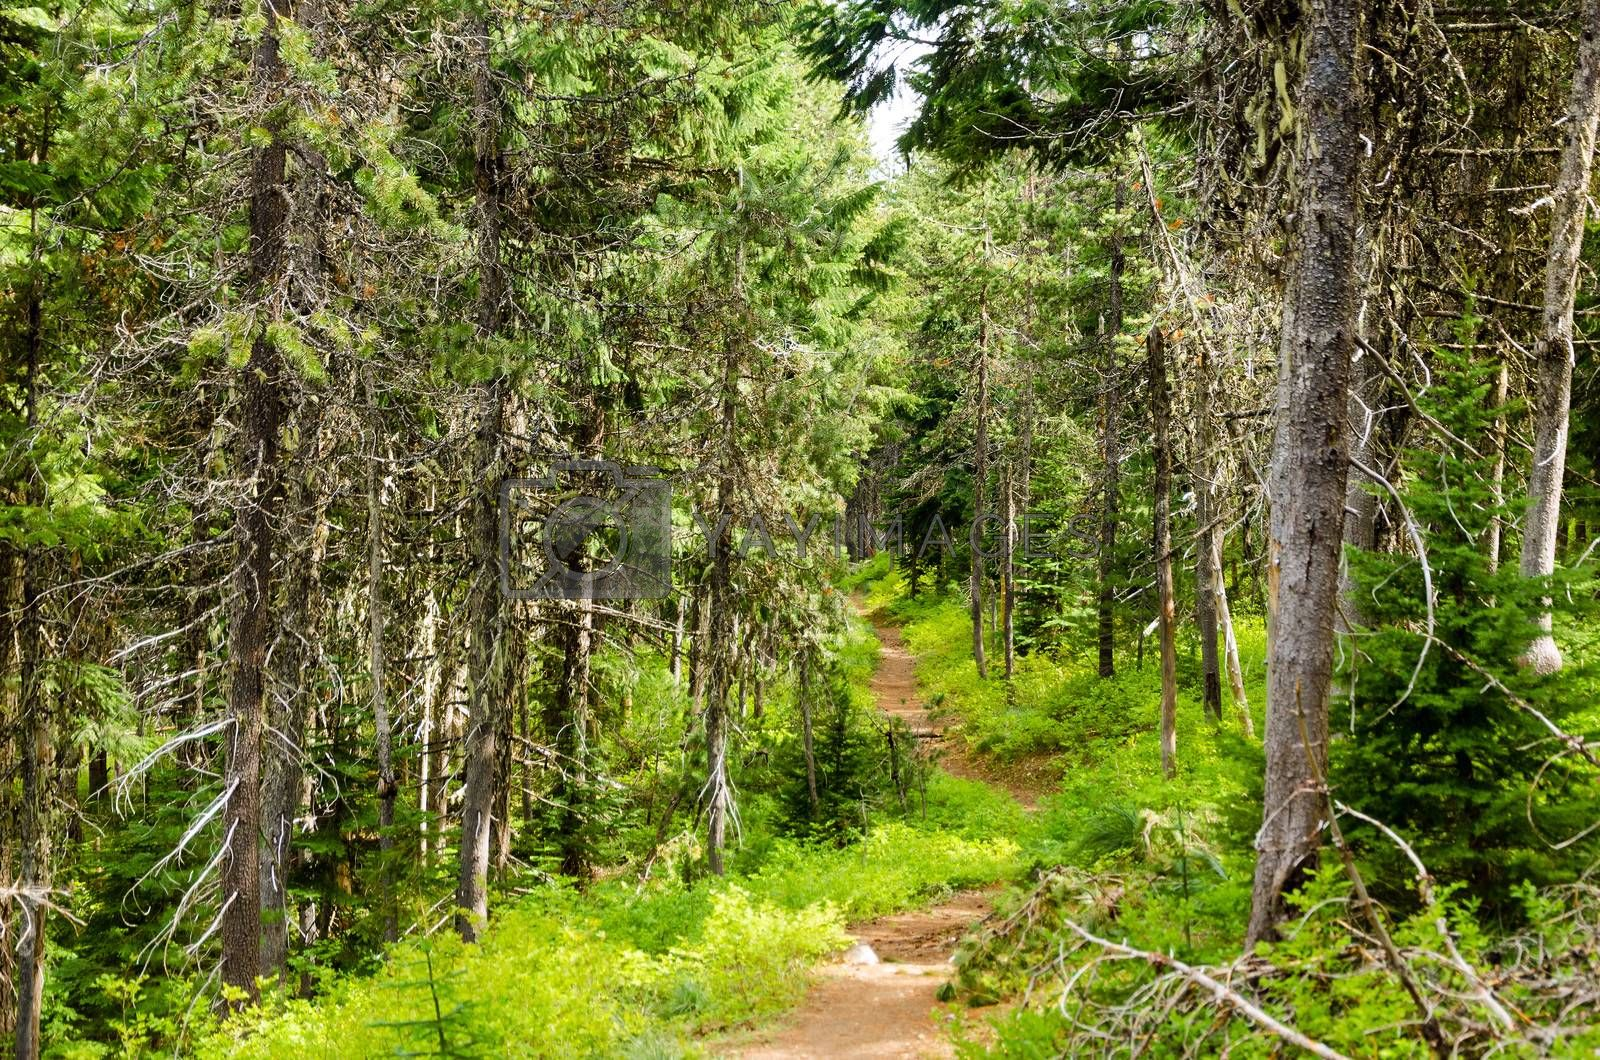 Trail running through Mt. Hood National Forest